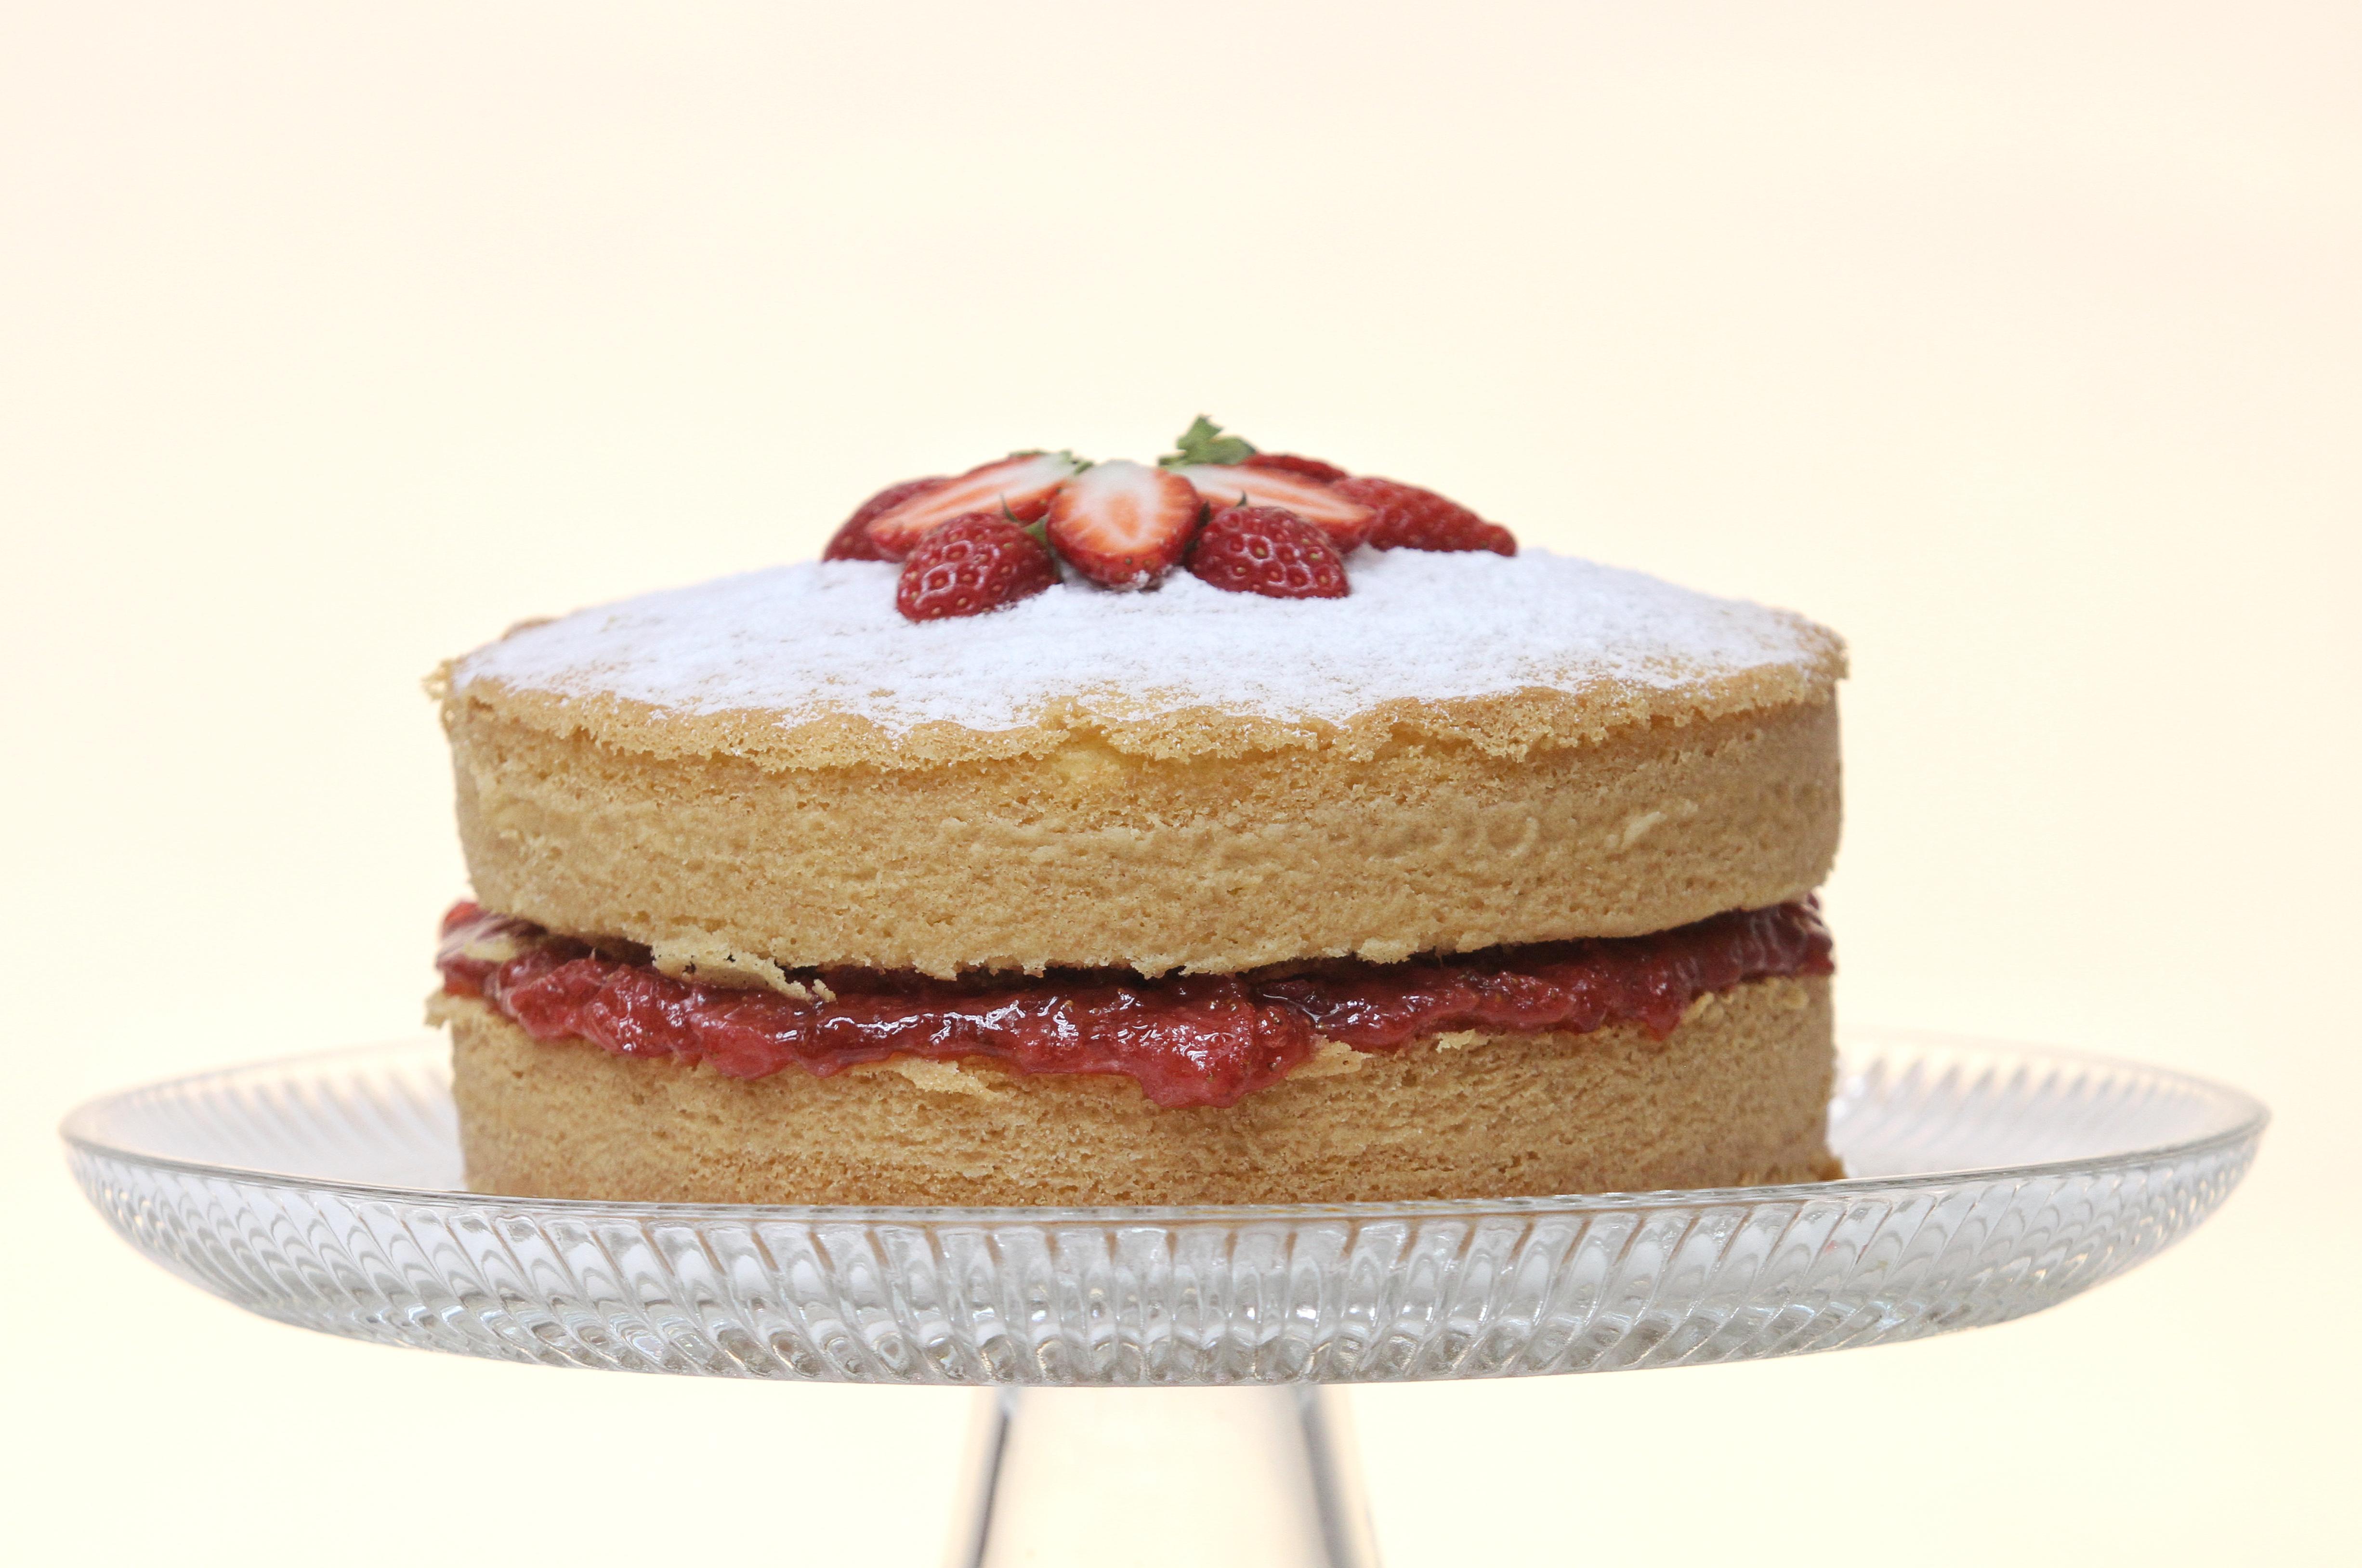 VIctoria sandwich - a classic British cake